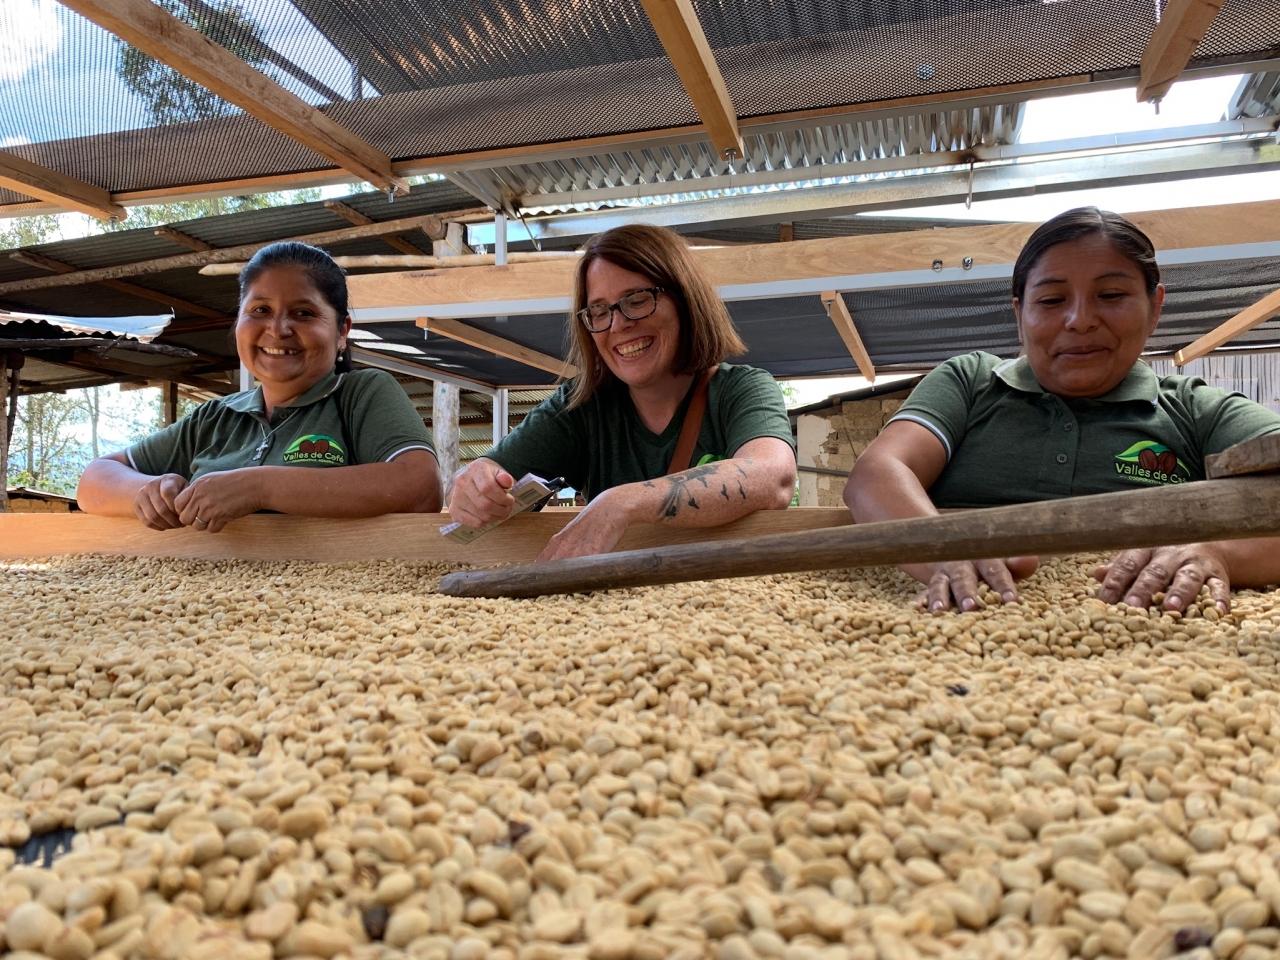 Three people sort coffee beans